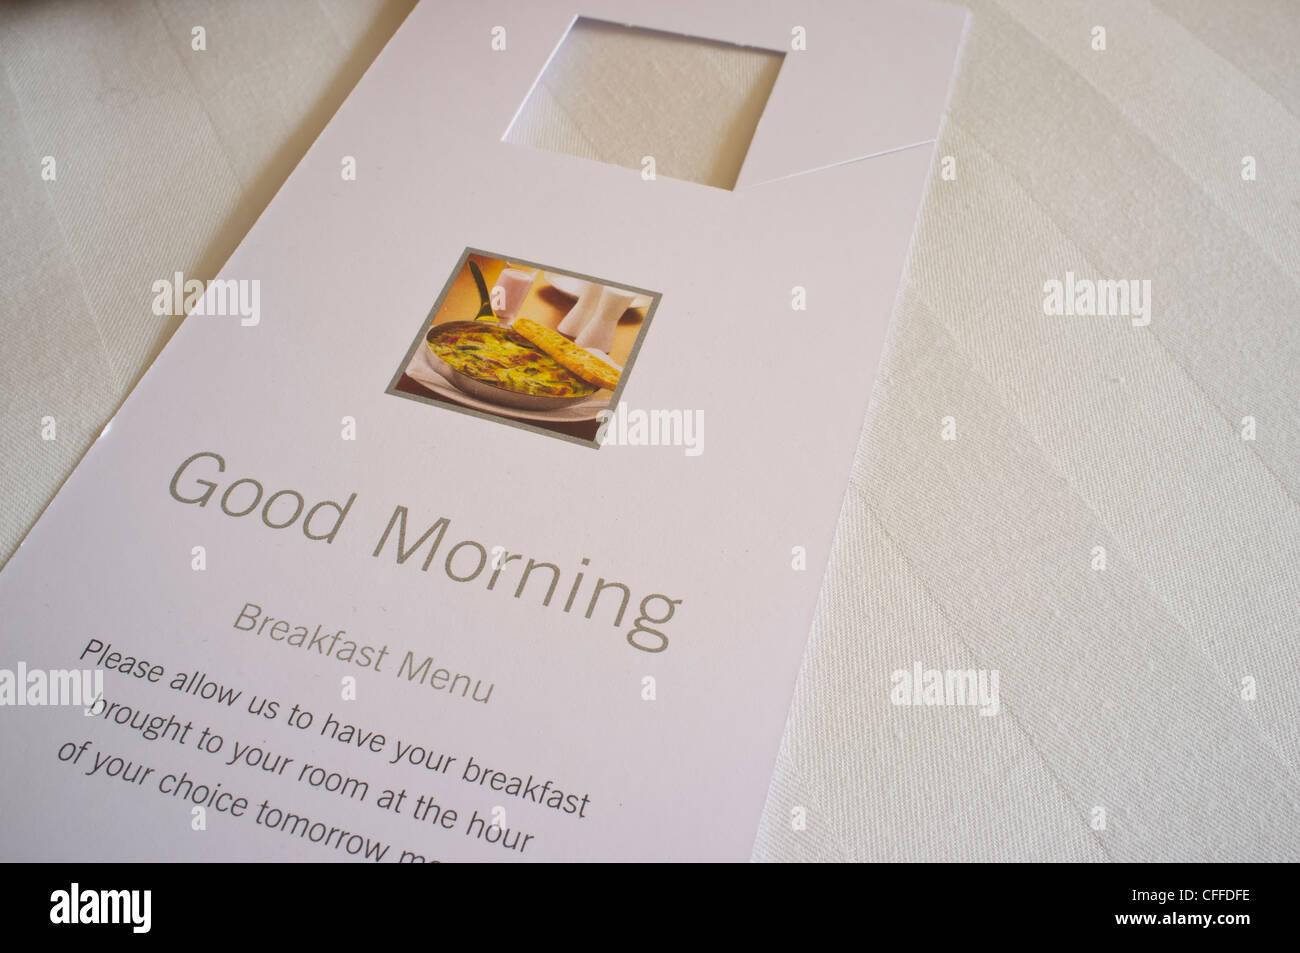 Good Morning Hotel Room Service Card Stock Photo, Royalty ...